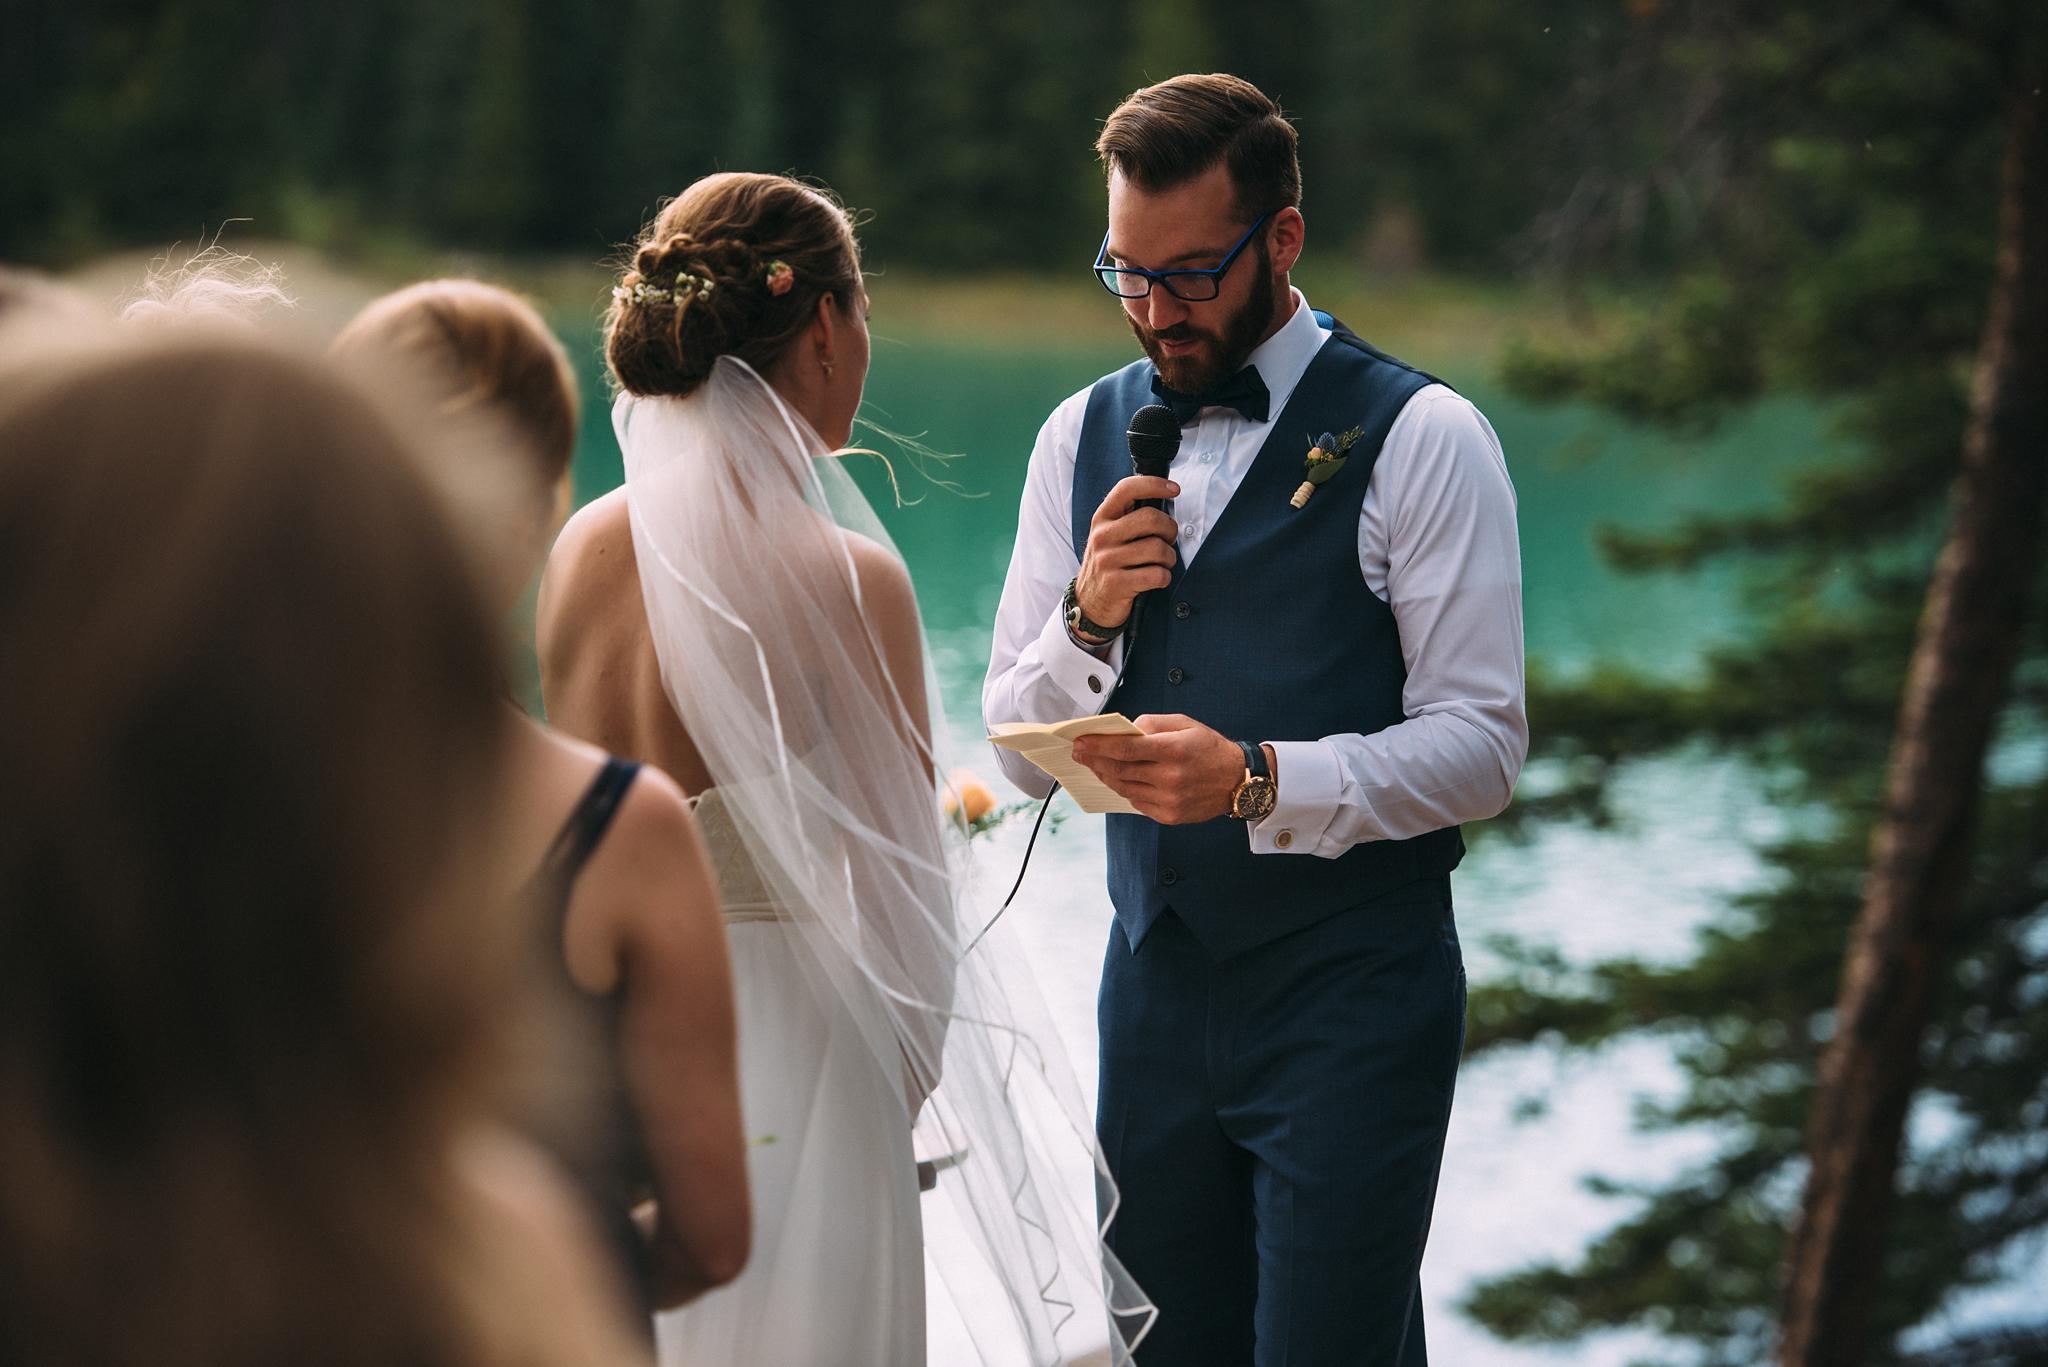 kaihla_tonai_intimate_wedding_elopement_photographer_2524